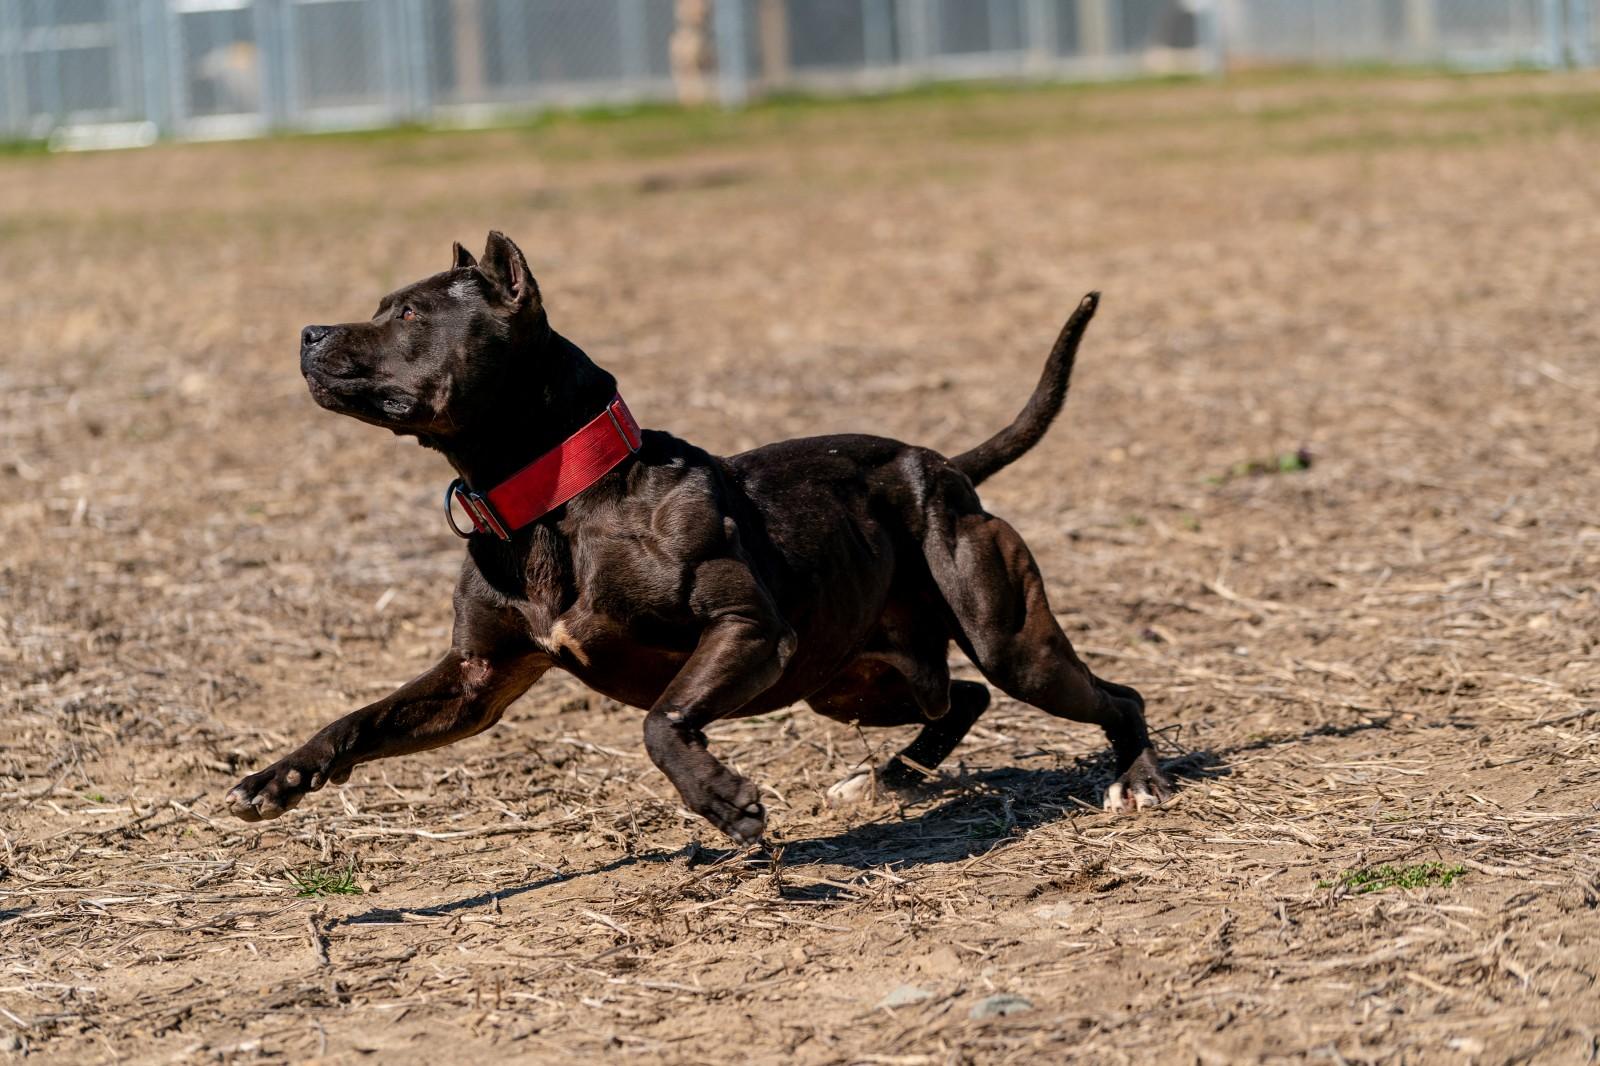 Batman, AKA Bruce Wayne, a muscular beast of a black pit bull wearing a red collar is frozen mid-stride.